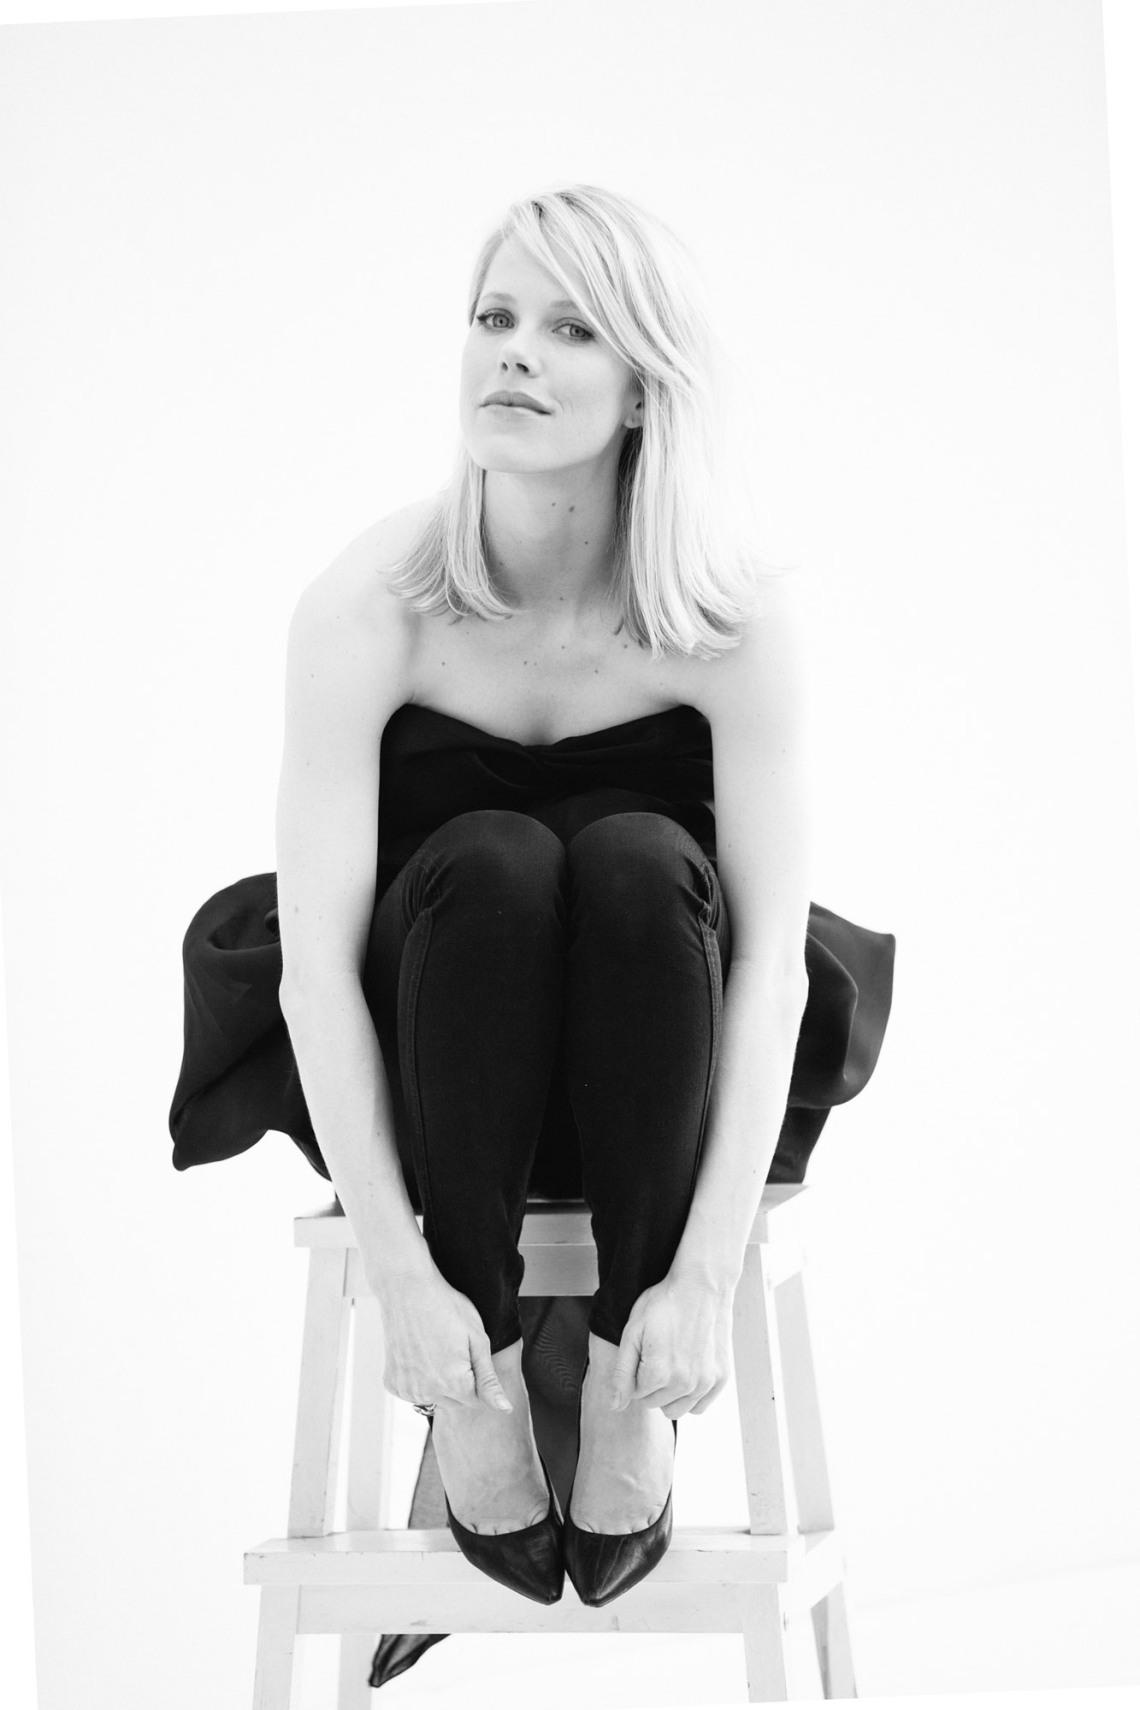 Alyssa McClelland for The National Treasures Series : Zoë Porter